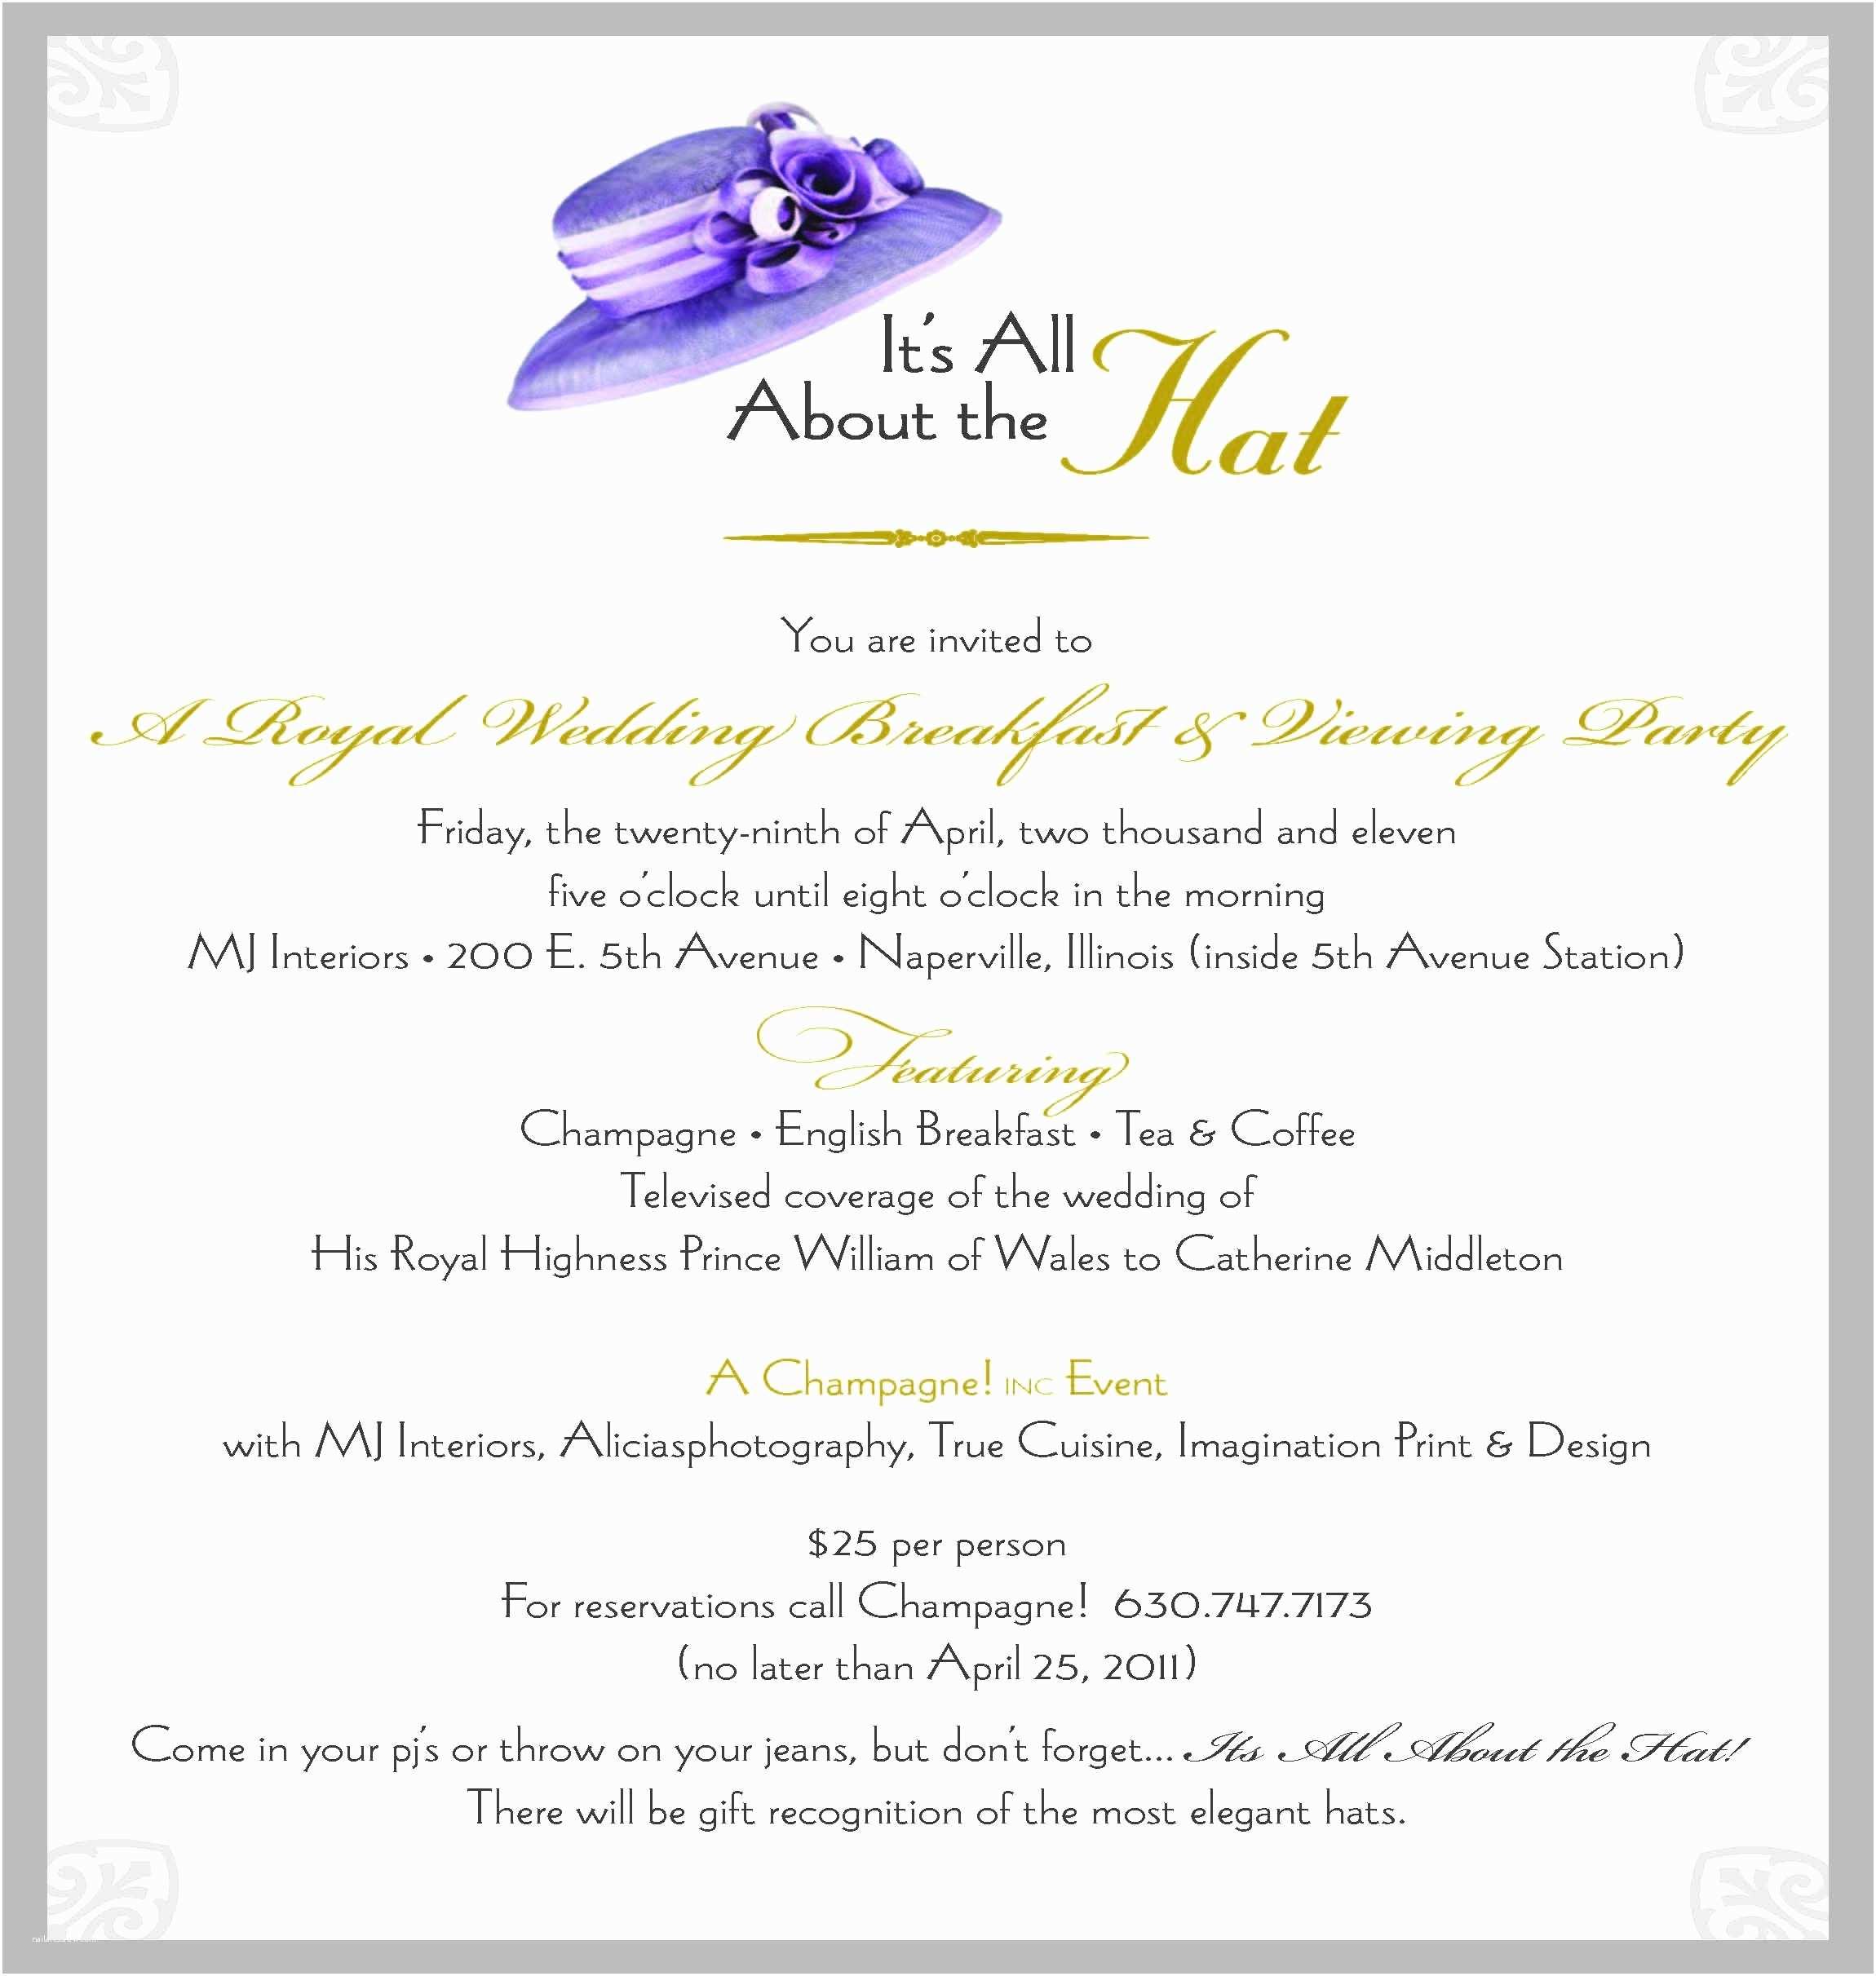 Facebook Wedding Invitation event Invites Wedding event Invite Funny